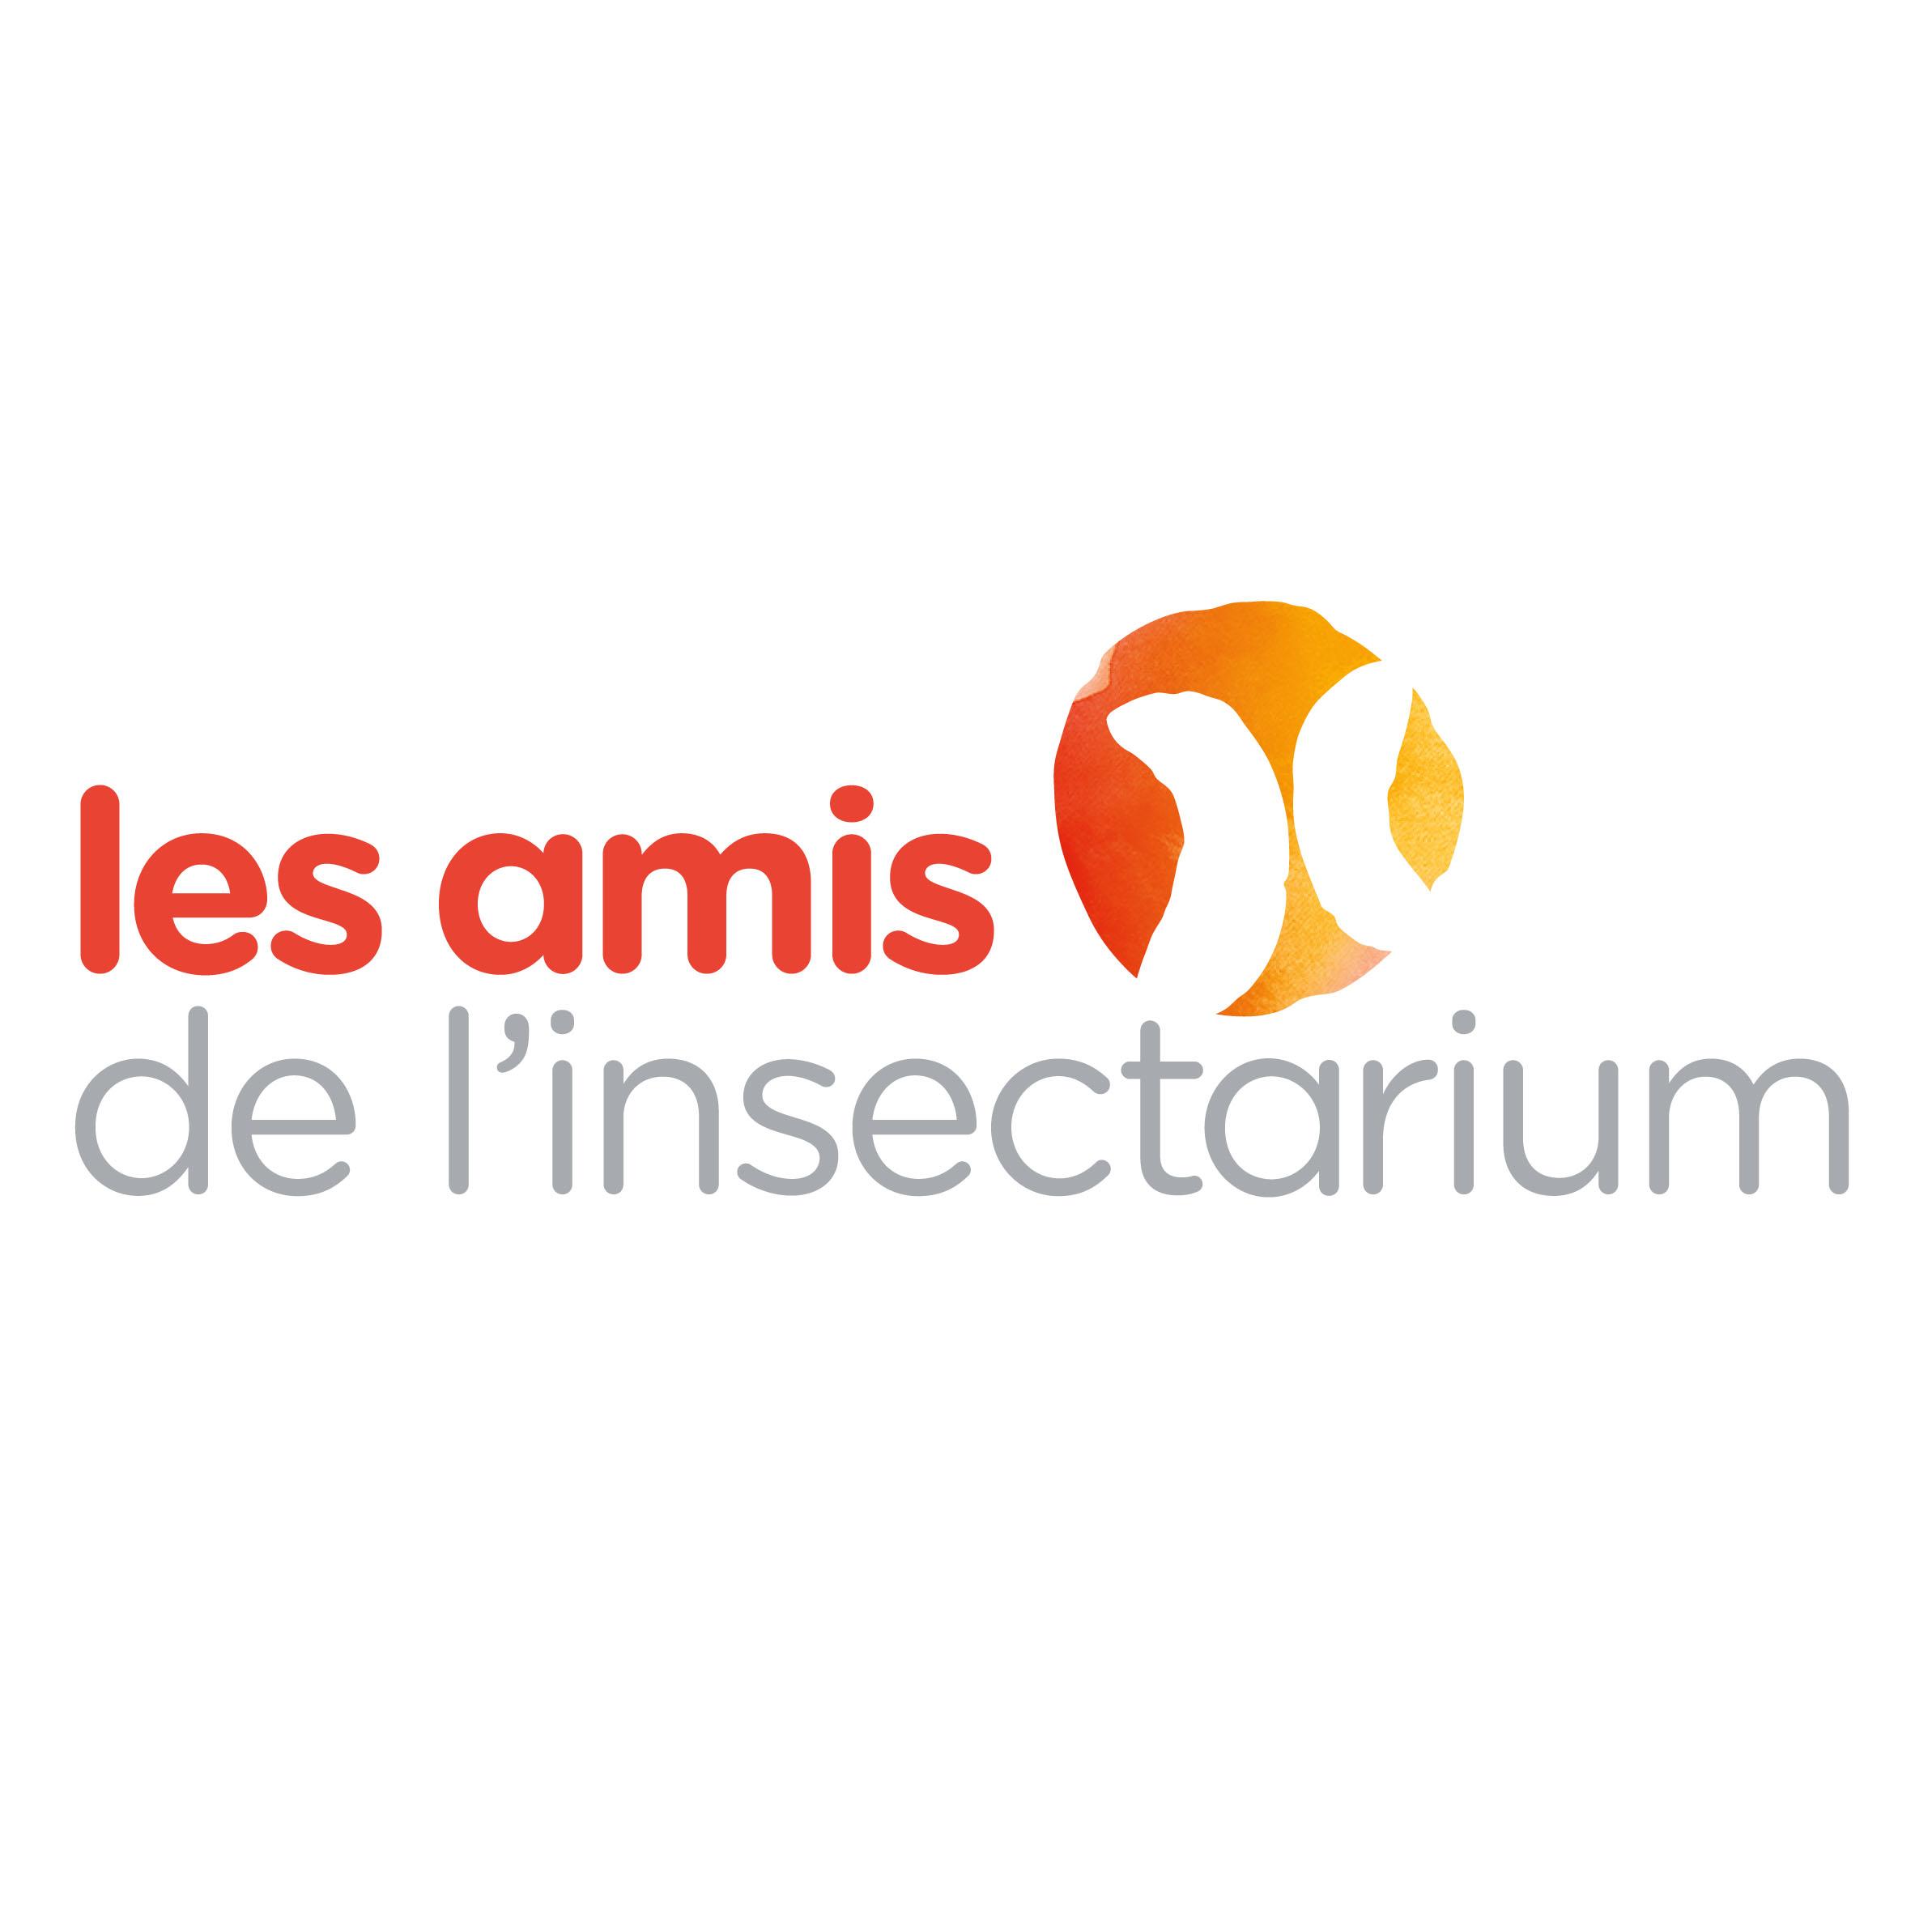 Les Amis de l'Insectarium de Montr�al